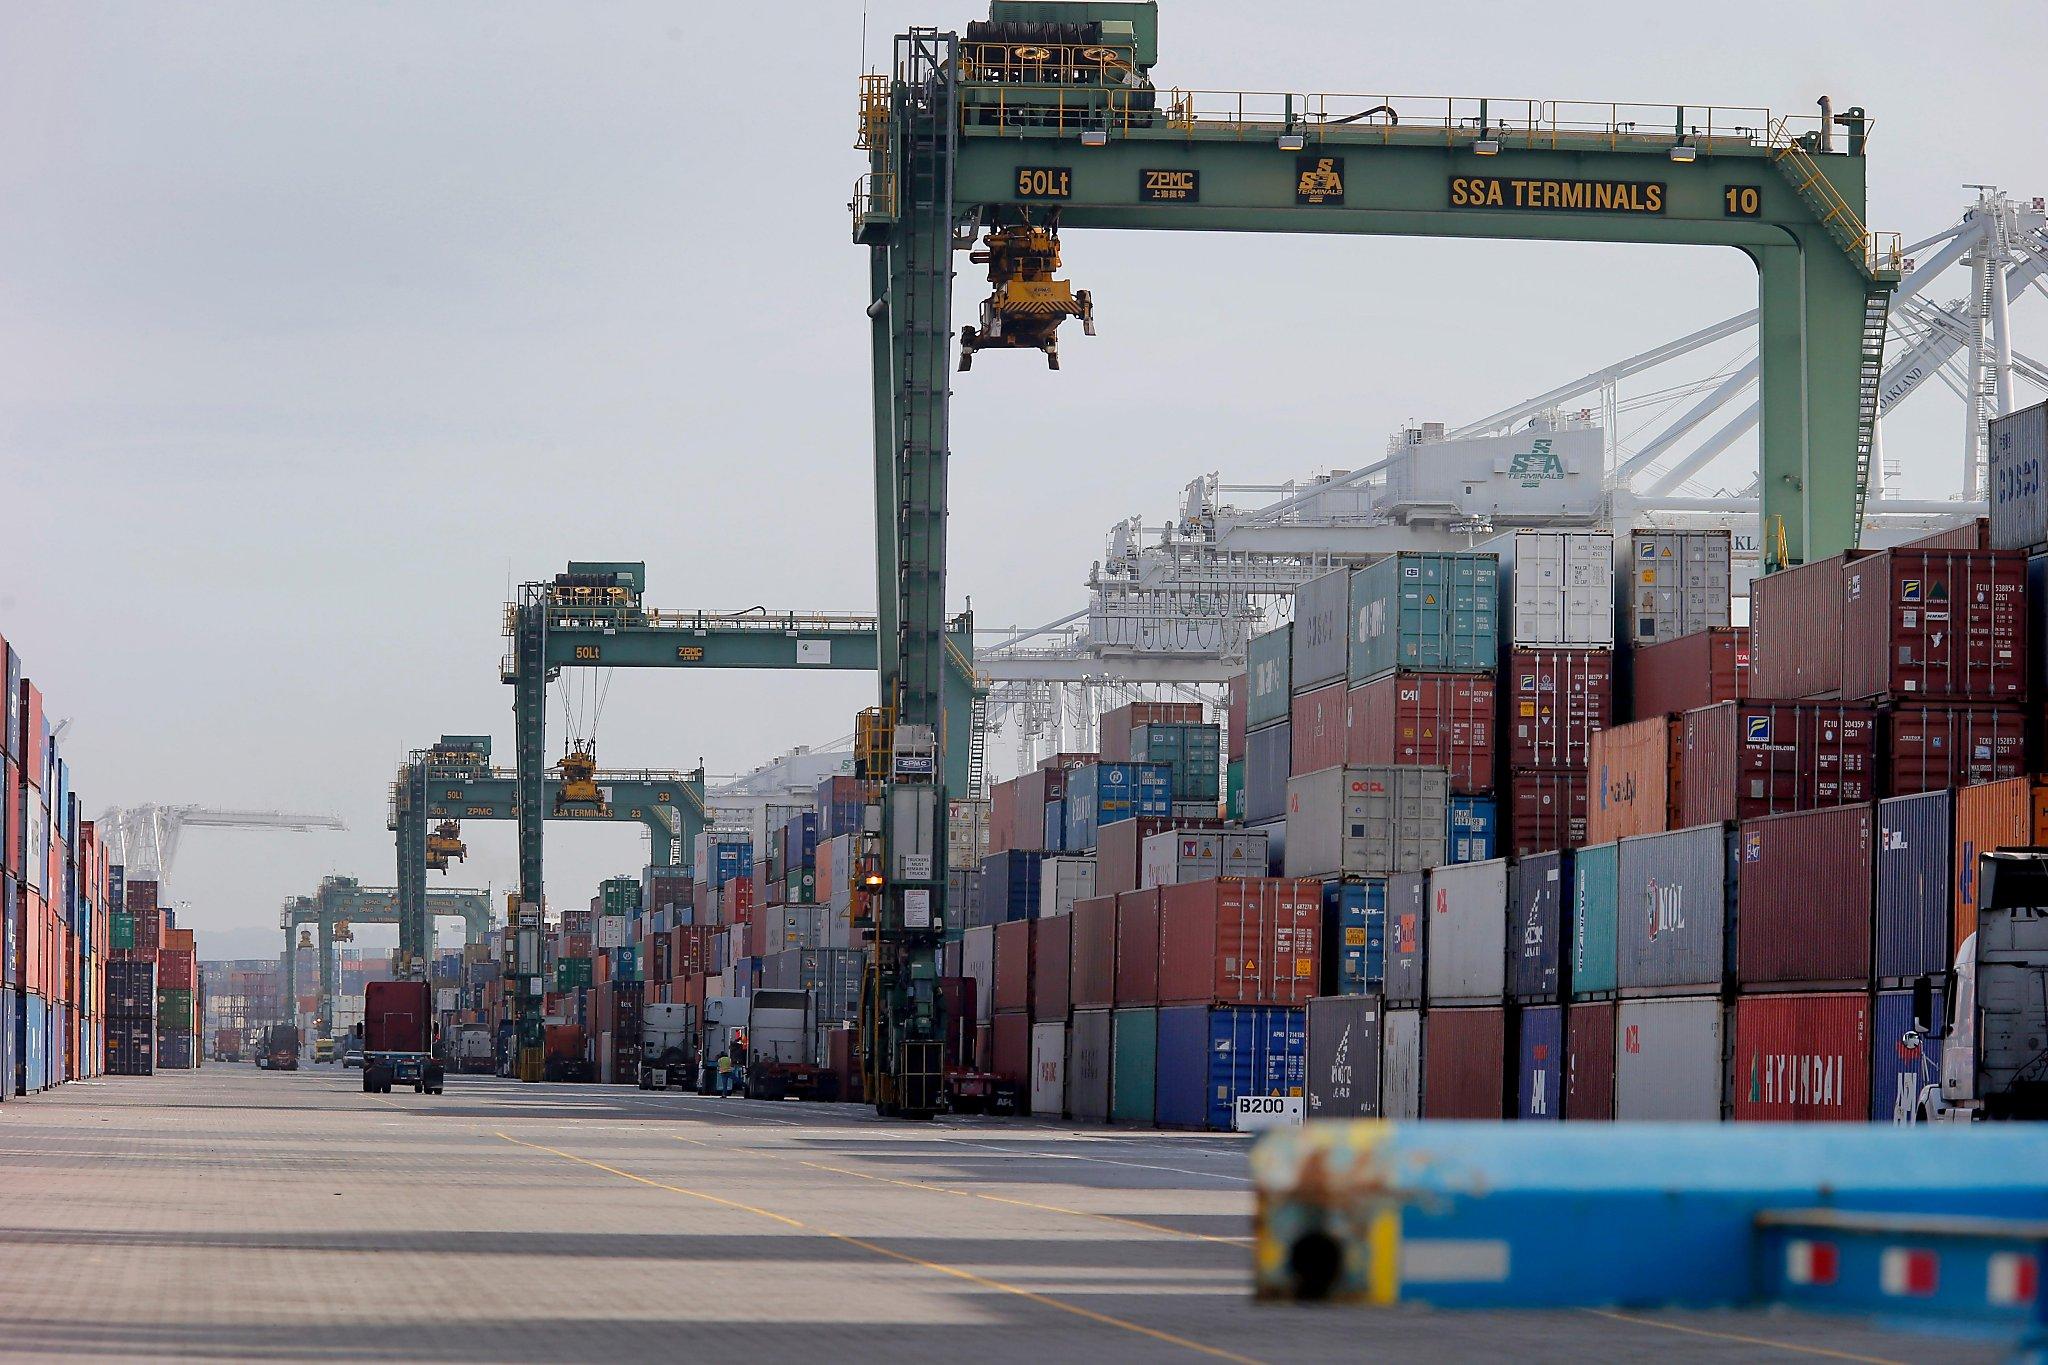 Coronavirus: Port of Oakland longshoremen threaten to walk off job